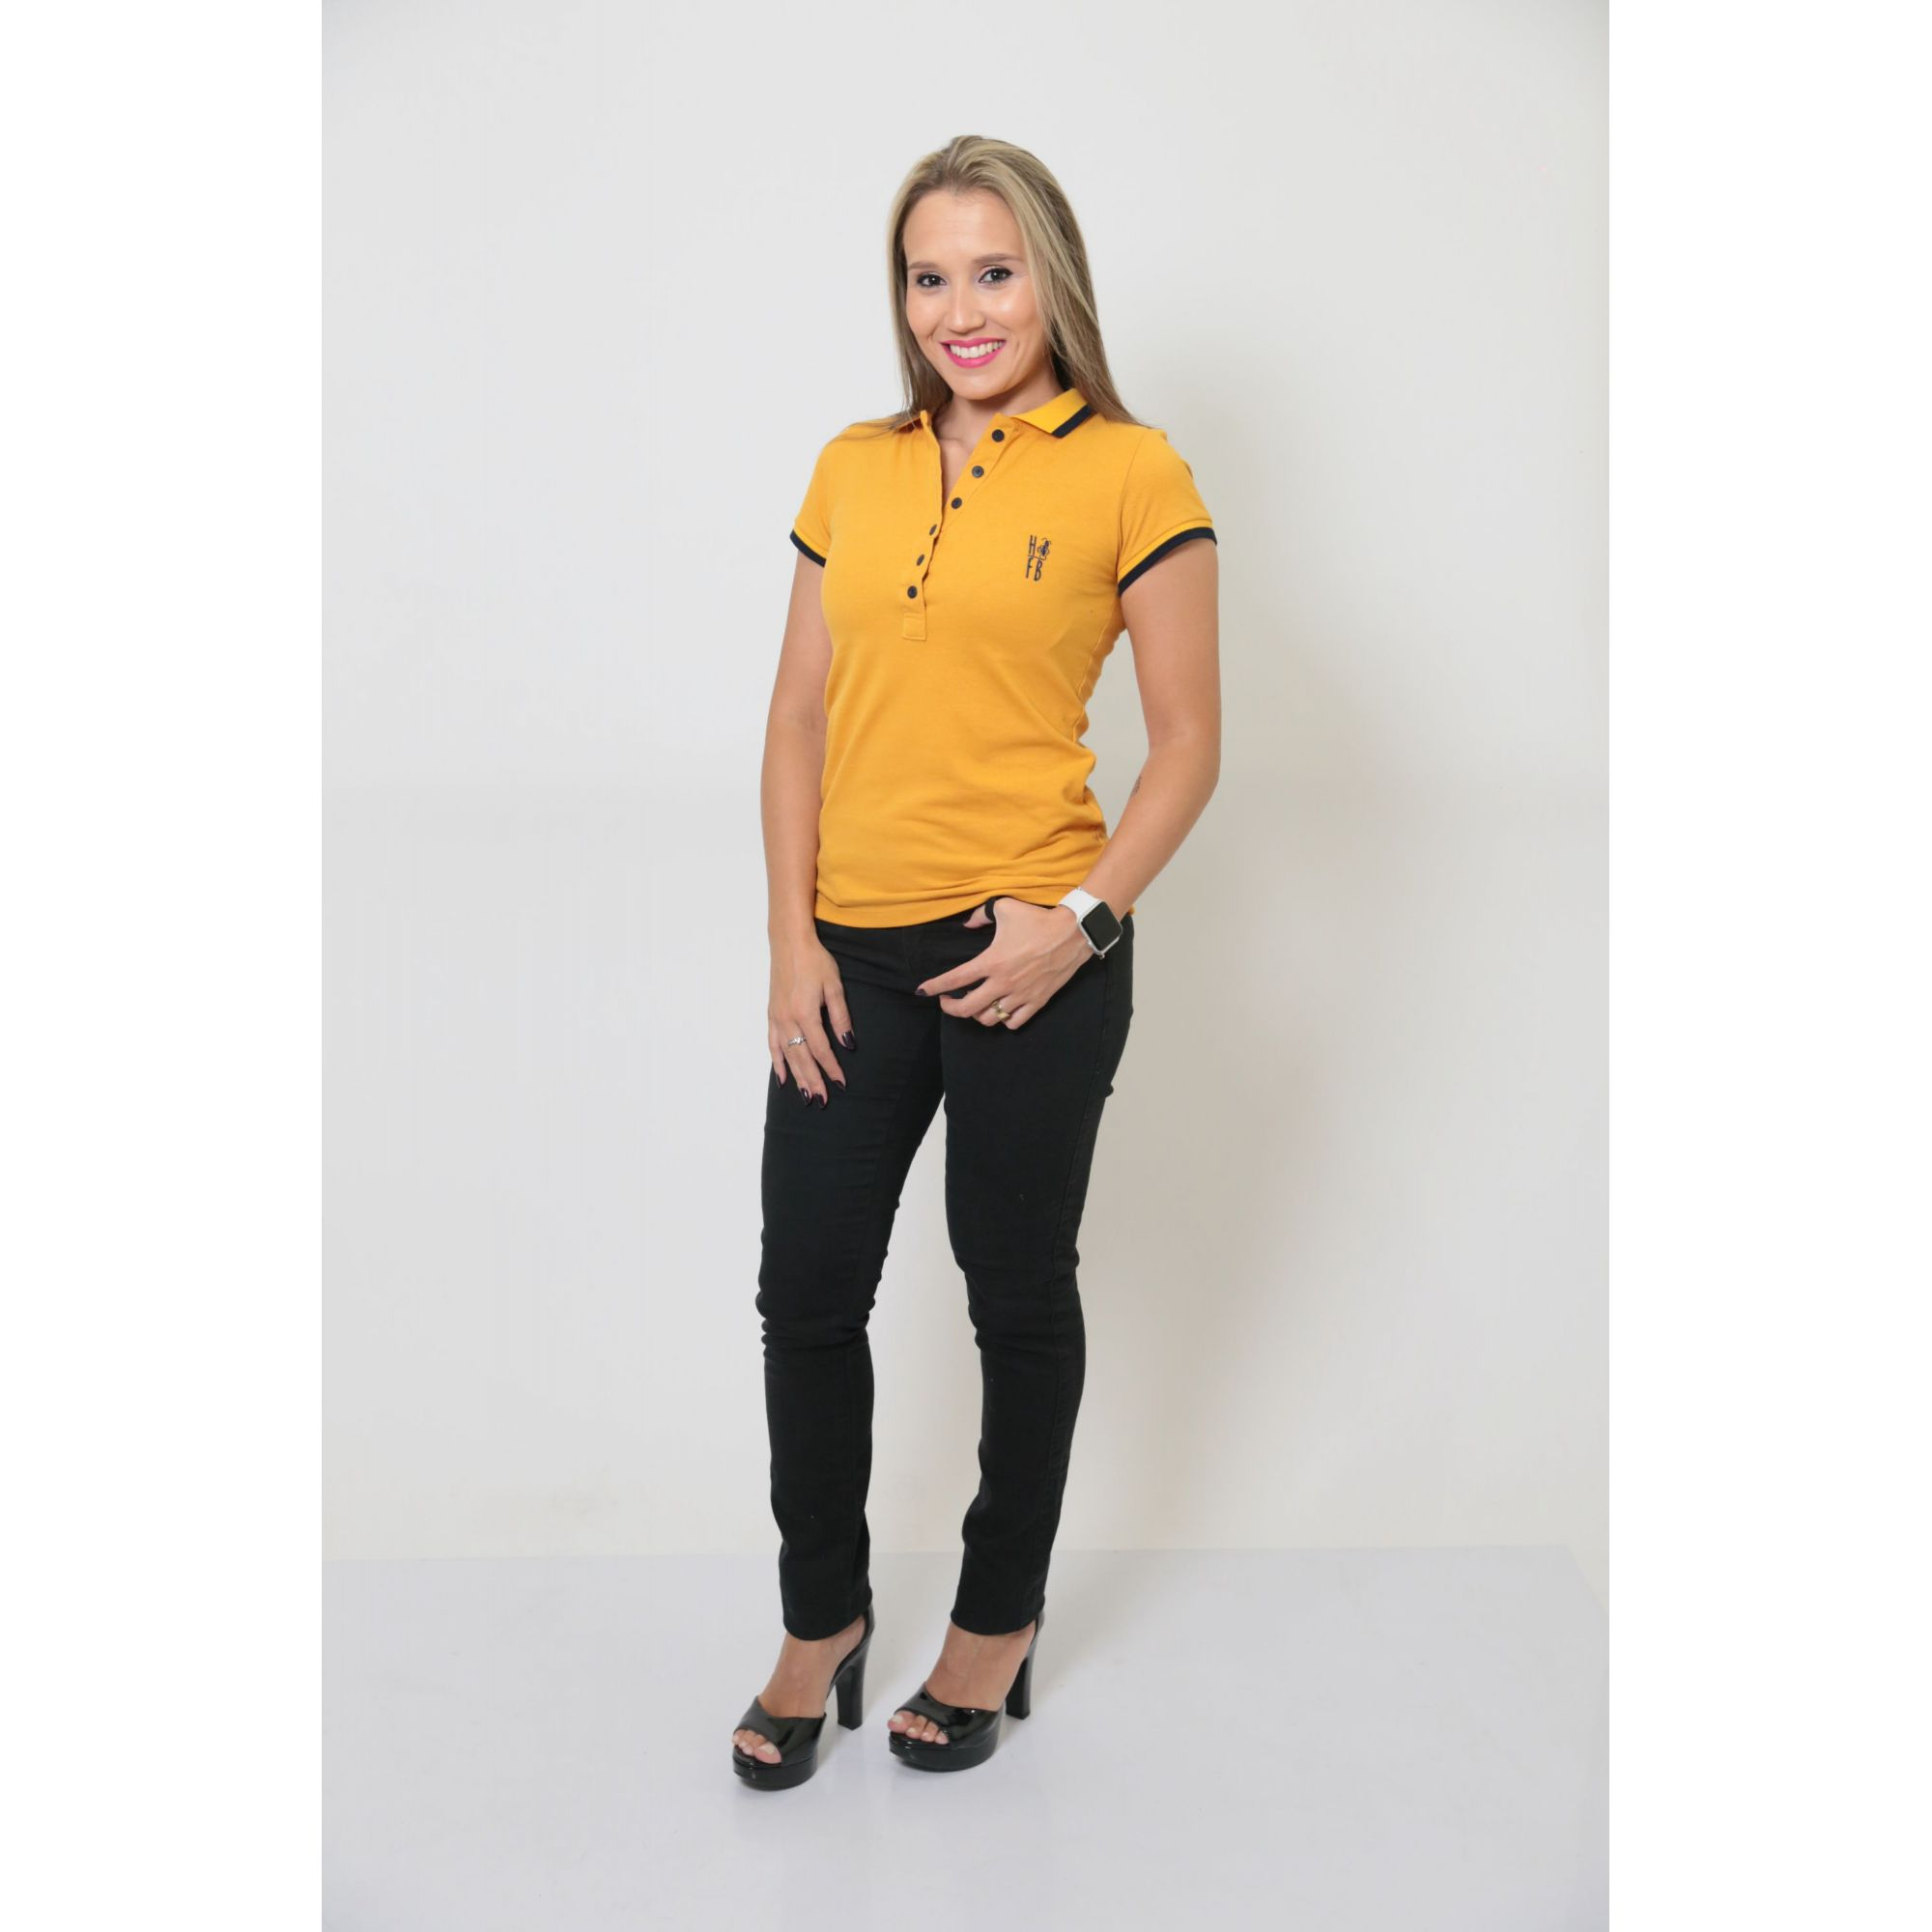 Camisa Polo Feminina Mostarda  - Heitor Fashion Brazil